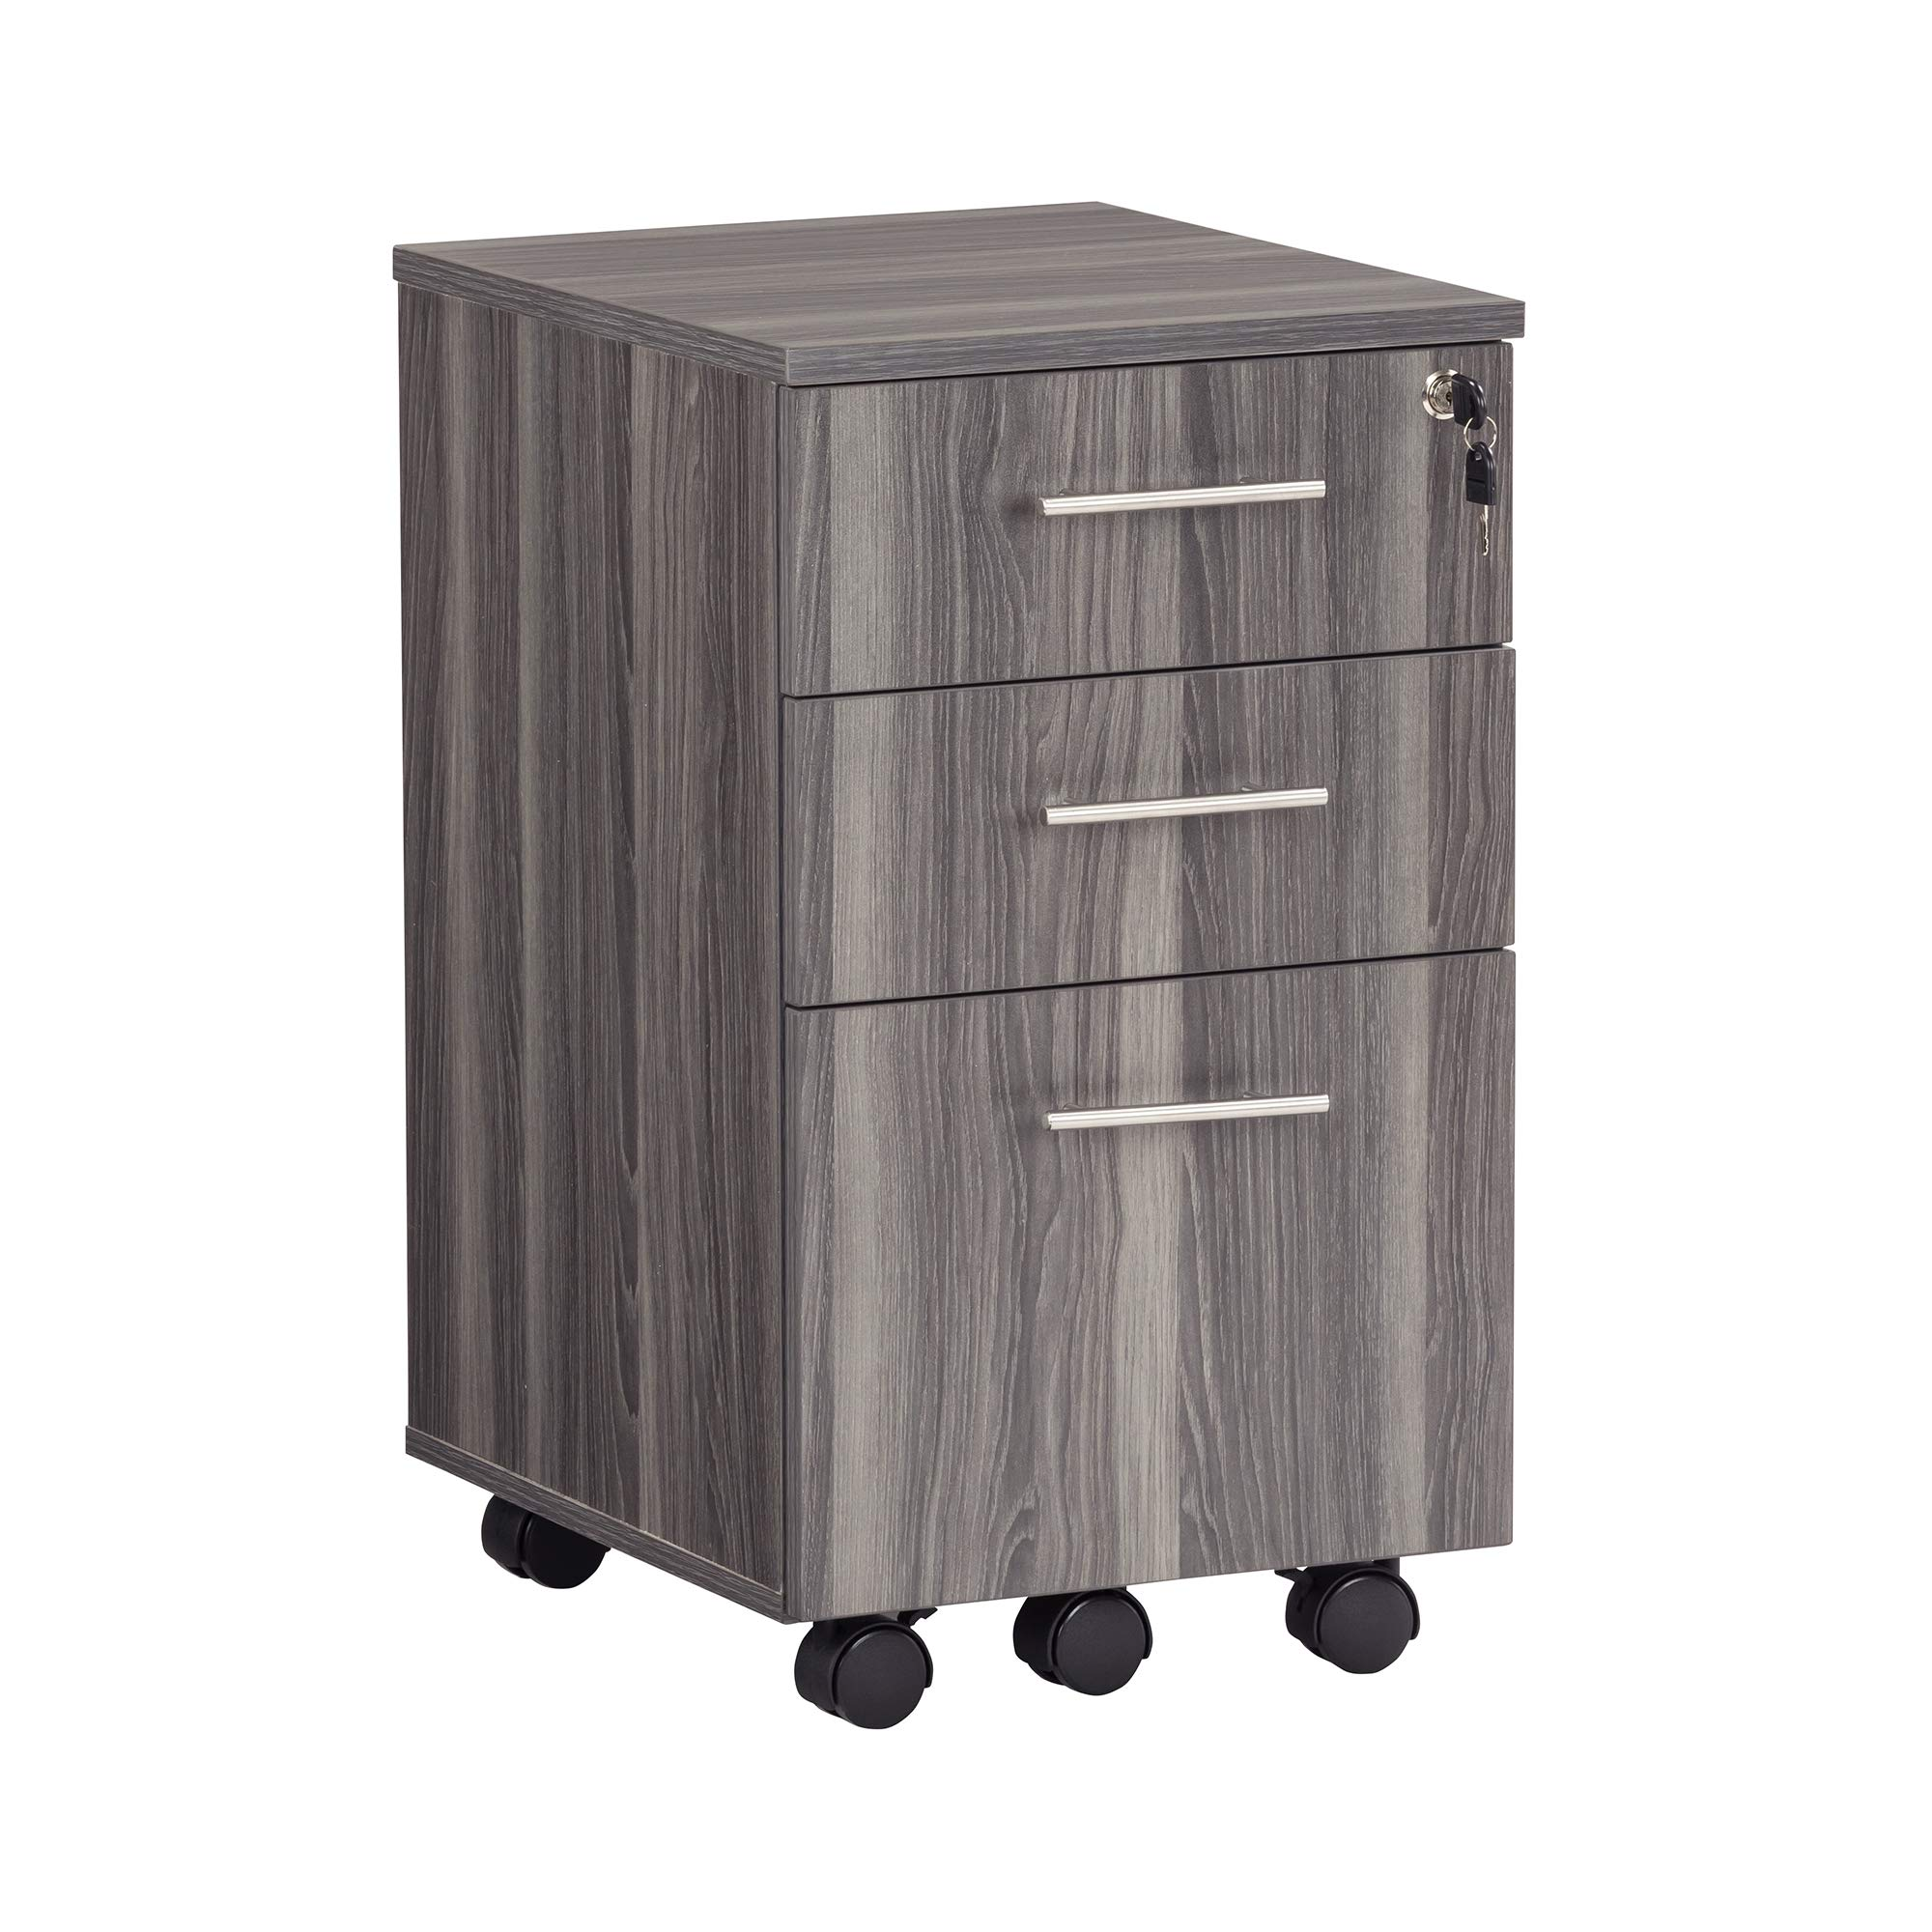 Safco Medina File Pedestal, Gray Steel, Gray Steel by Safco